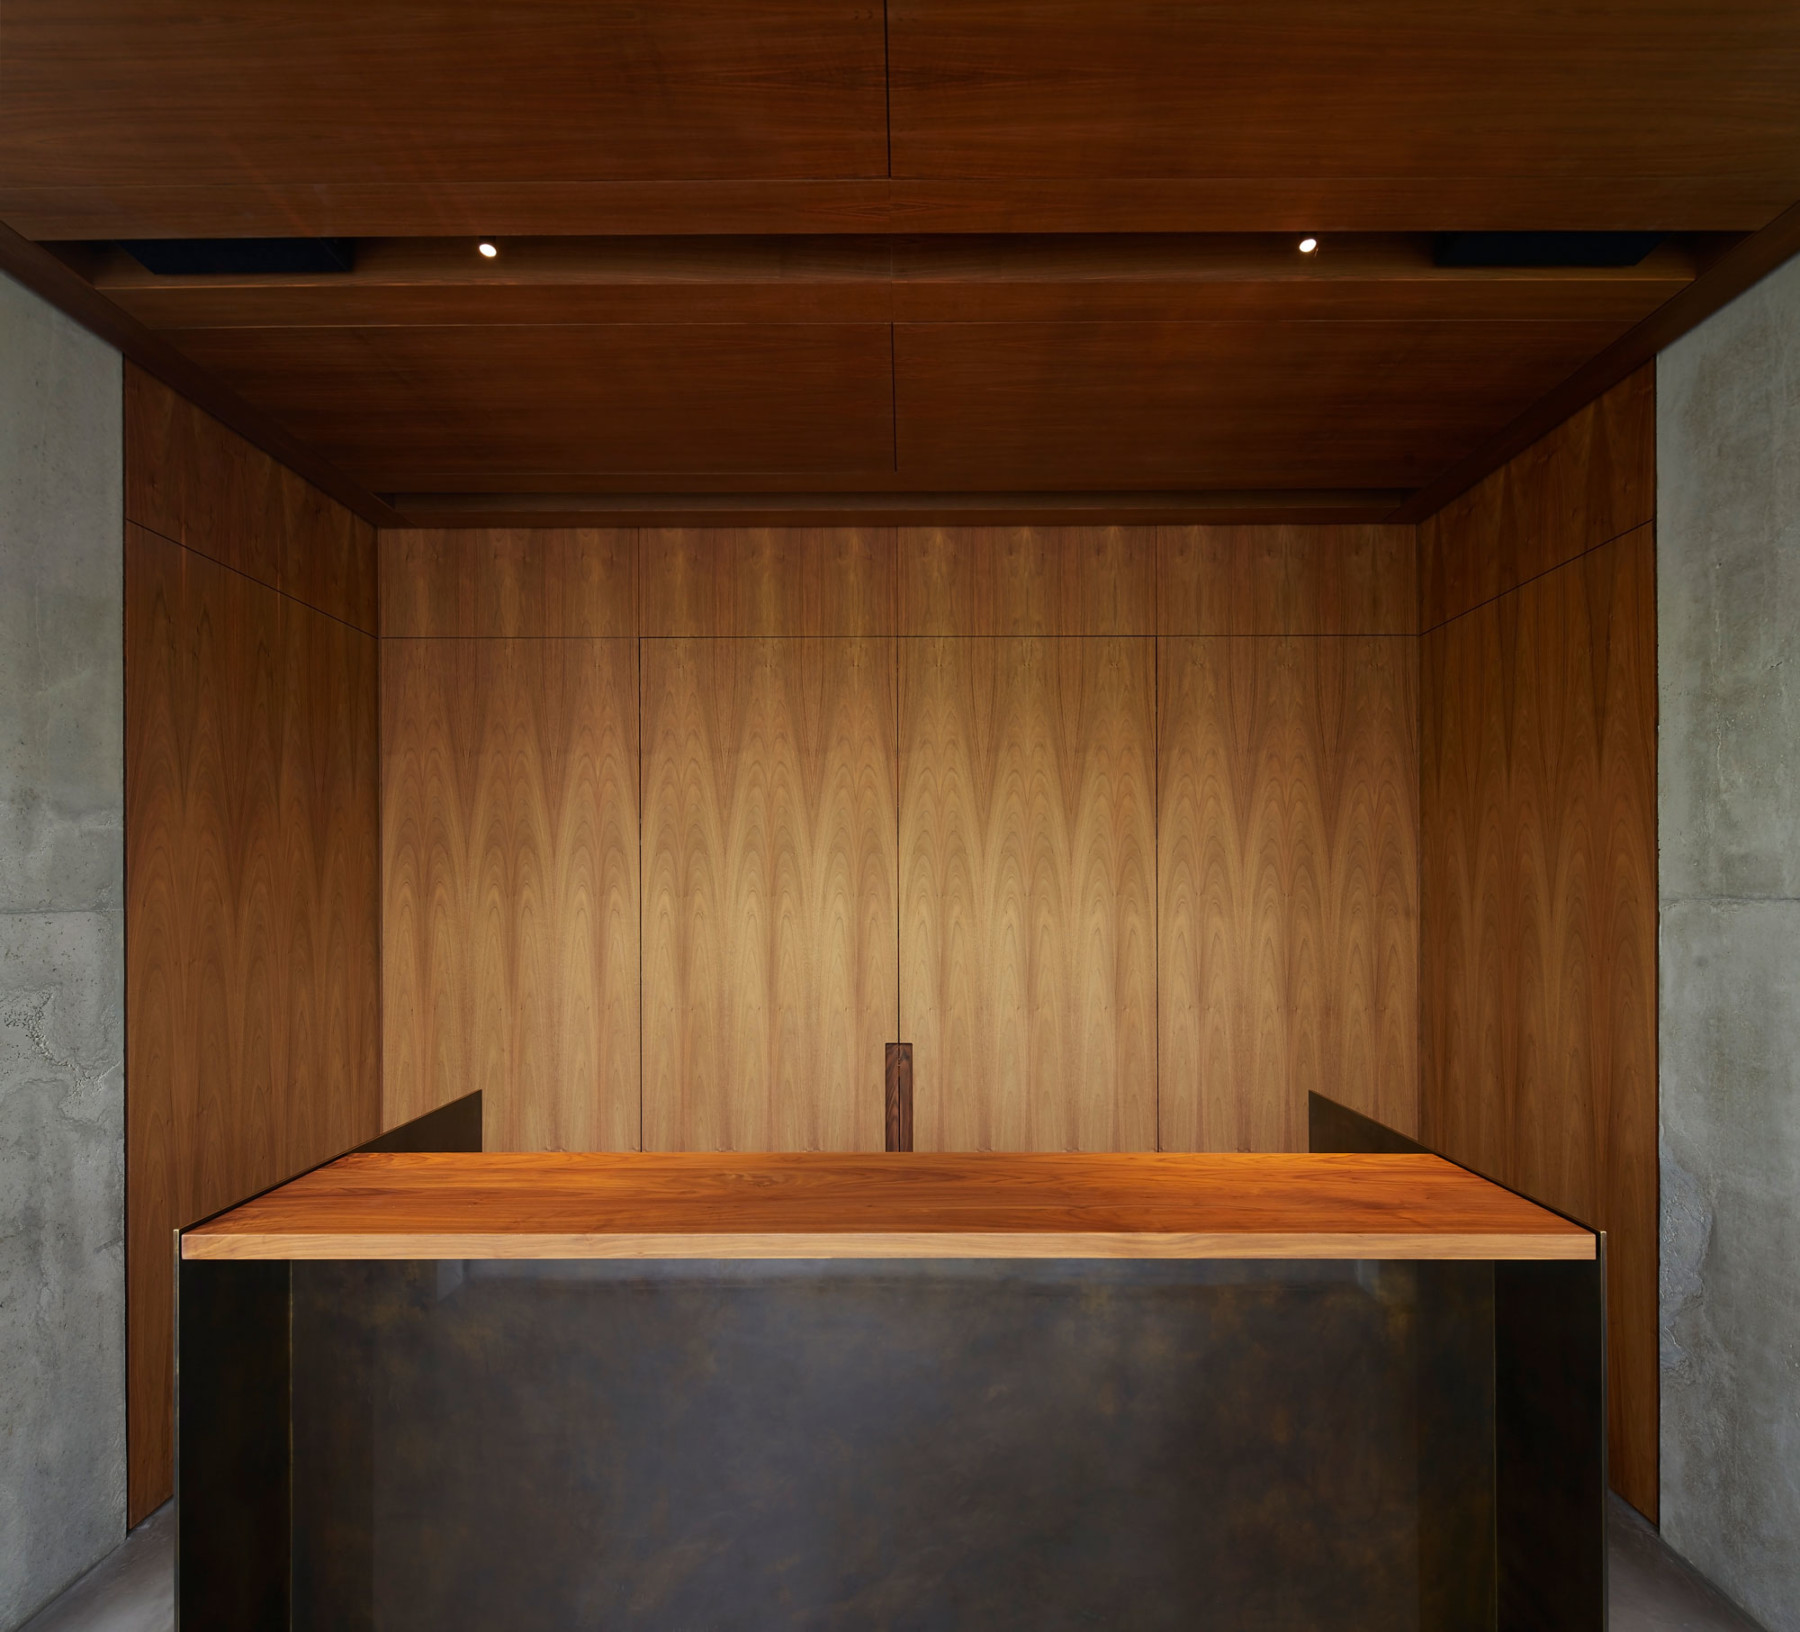 Jamie-Fobert-Architects travertine-house Port-of-Spain Trinidad Hufton+Crow 066